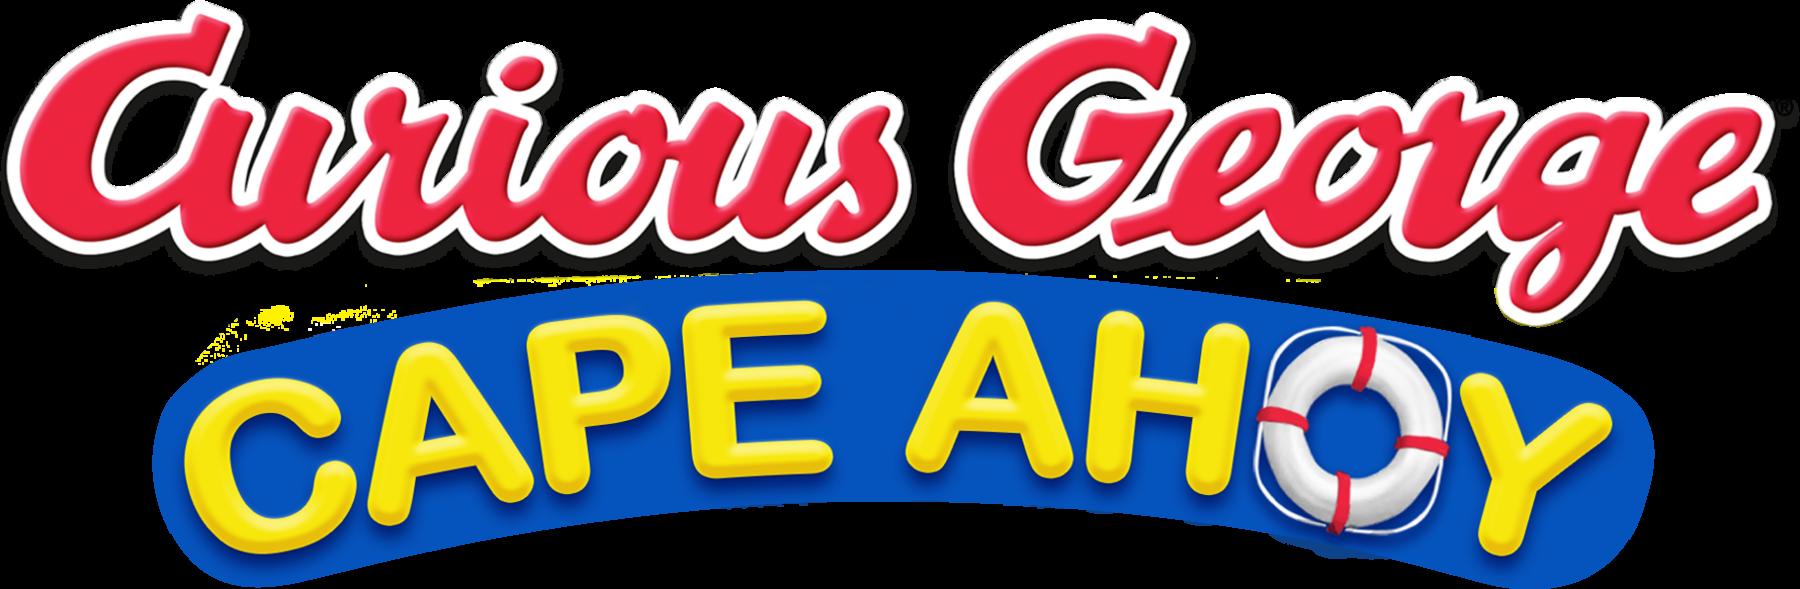 Curious George: Cape Ahoy